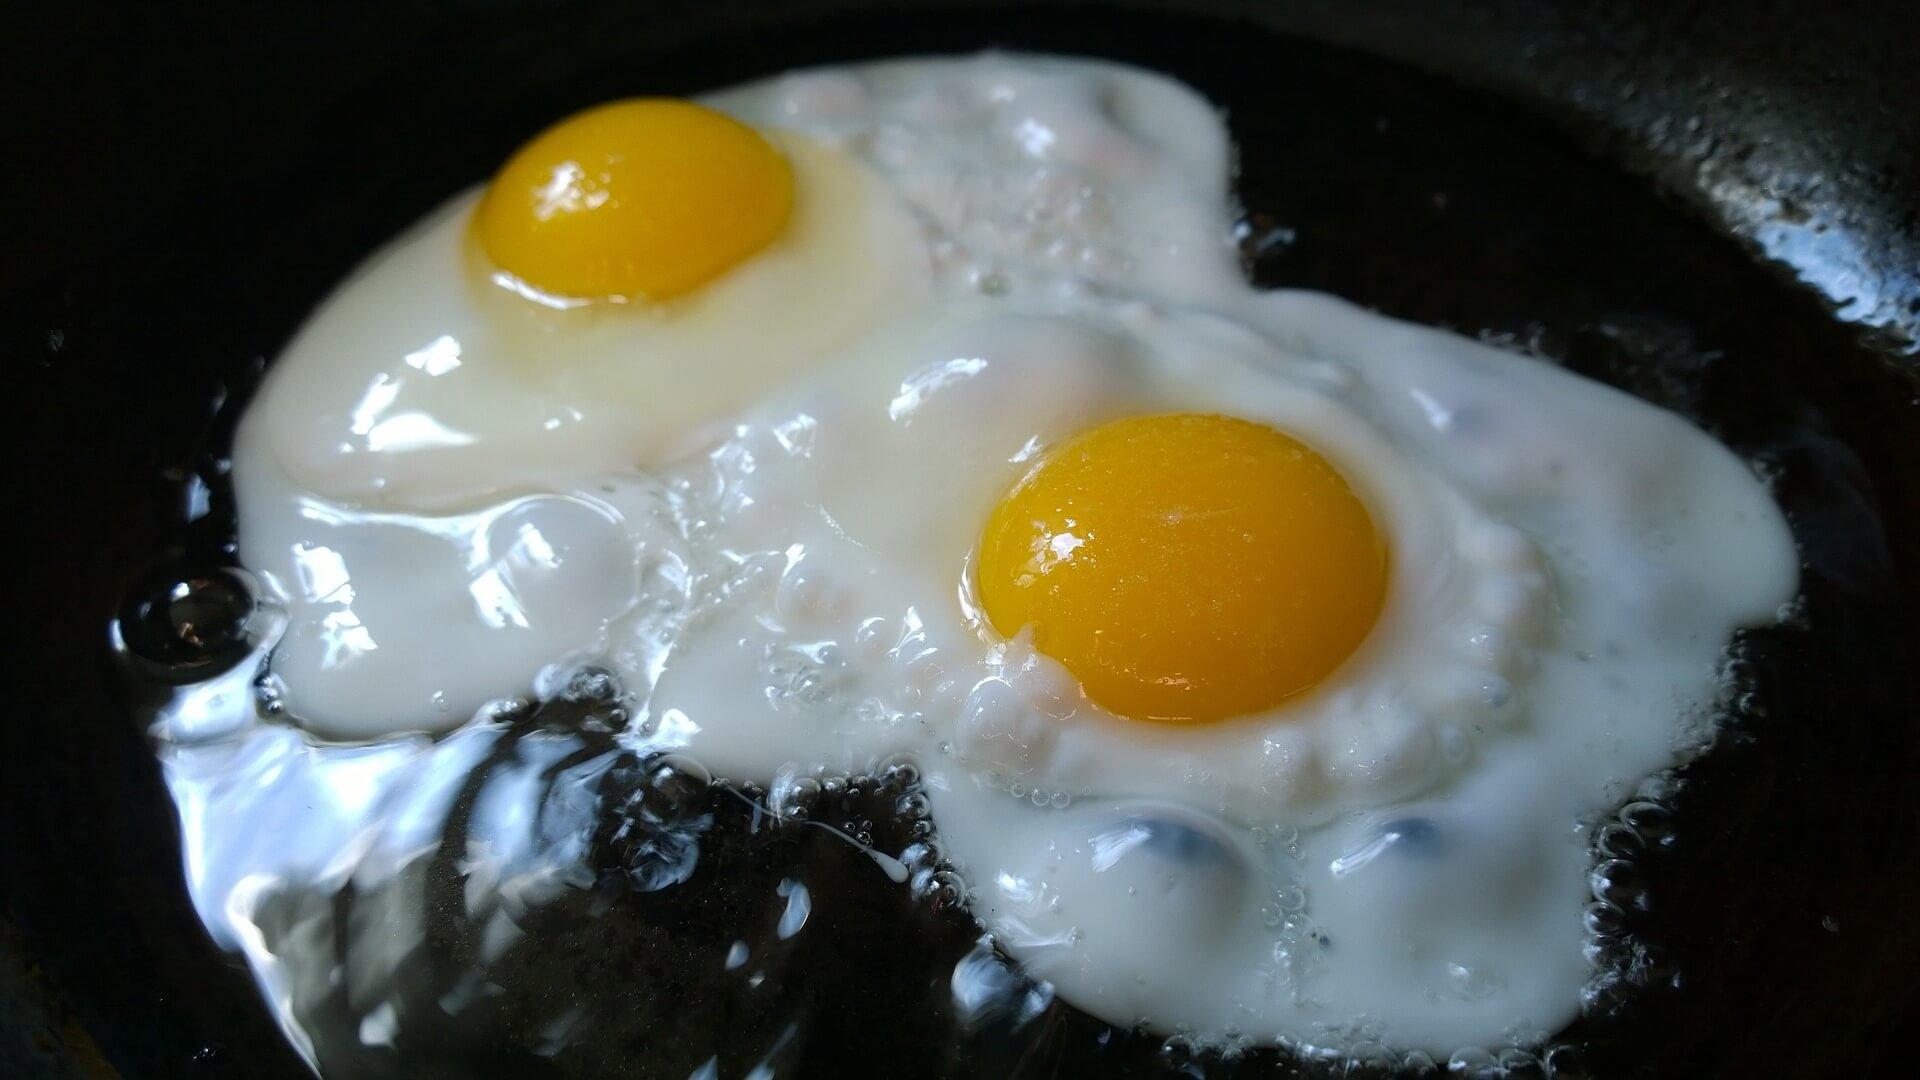 Ketogene Ernährung Lebensmittel Beispiel: Eier